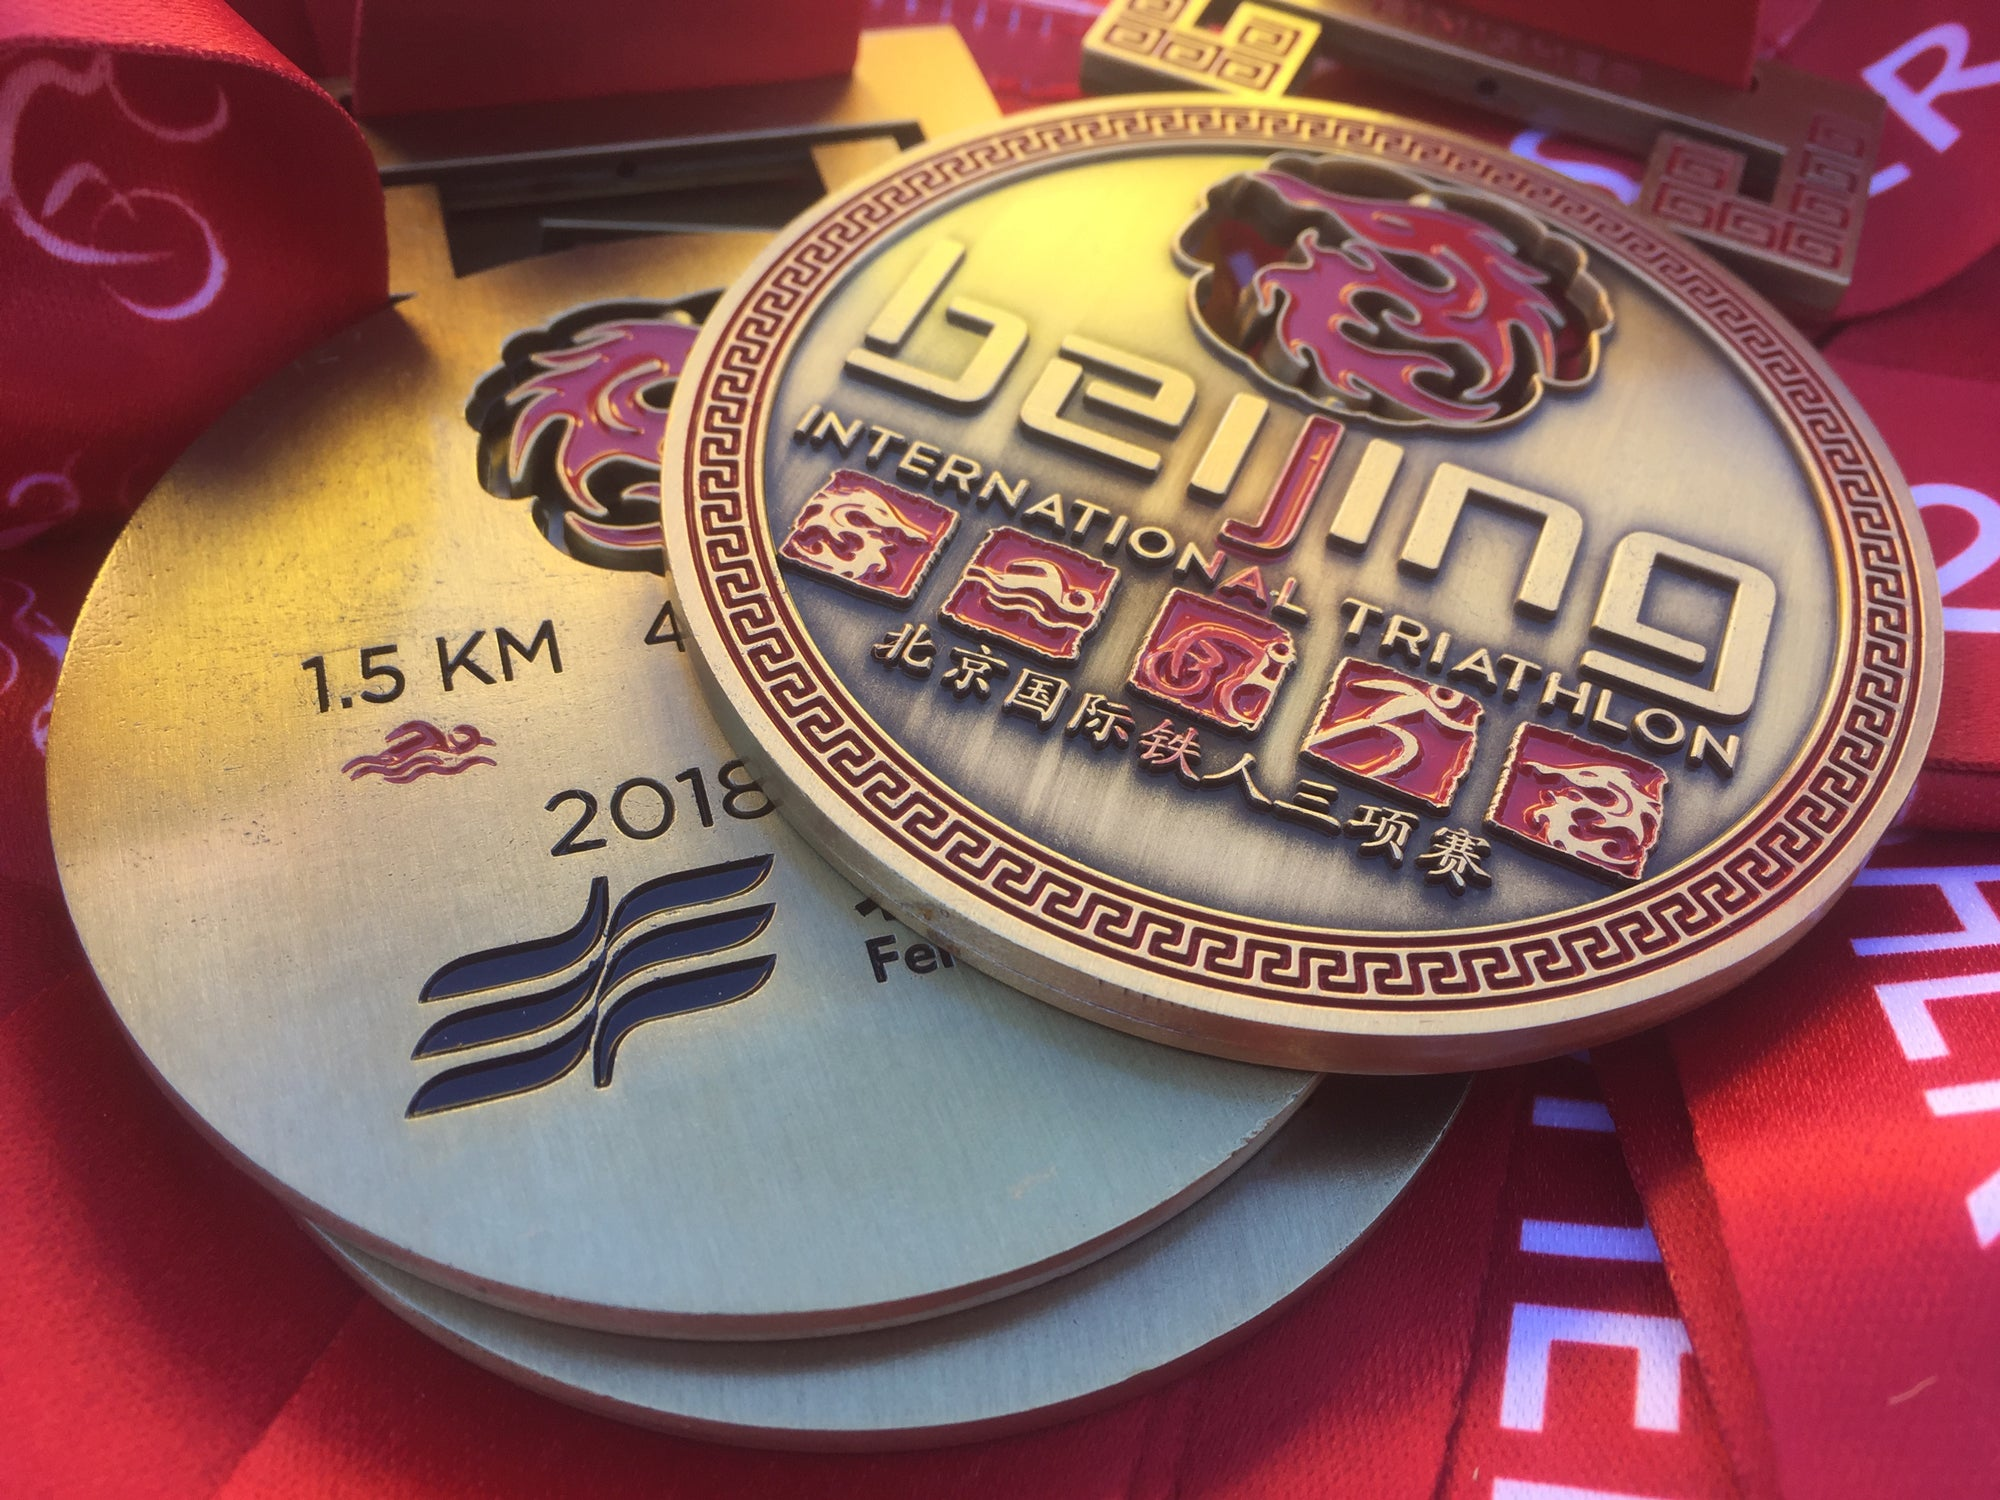 Triathlon in China